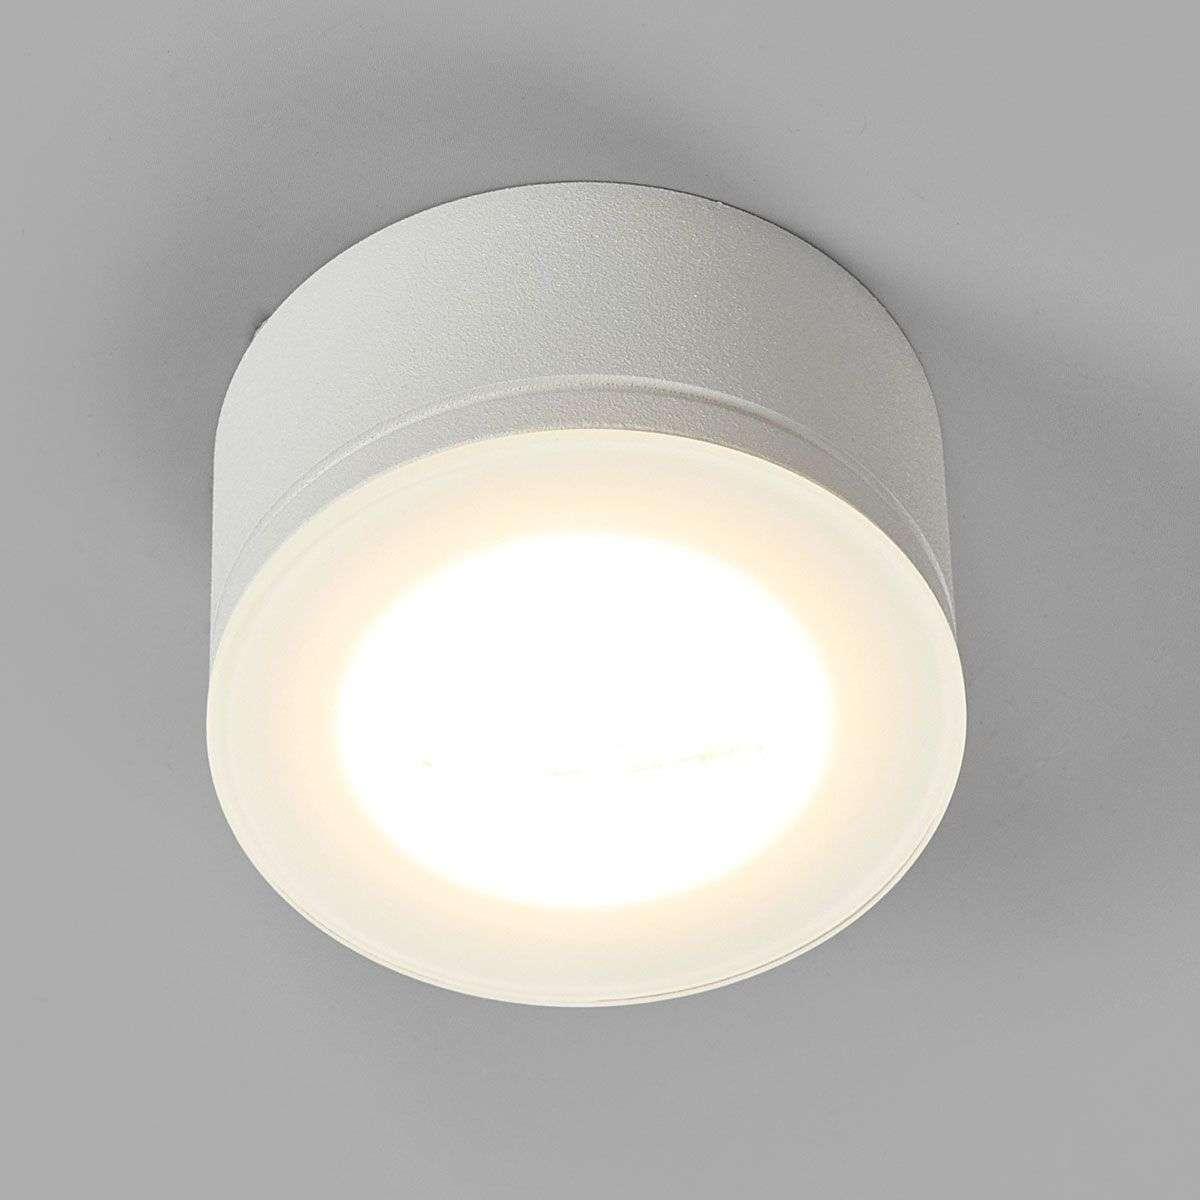 Newton 35 Led Ceiling Spotlight F Indoor Amp Outdoor Lights Ie